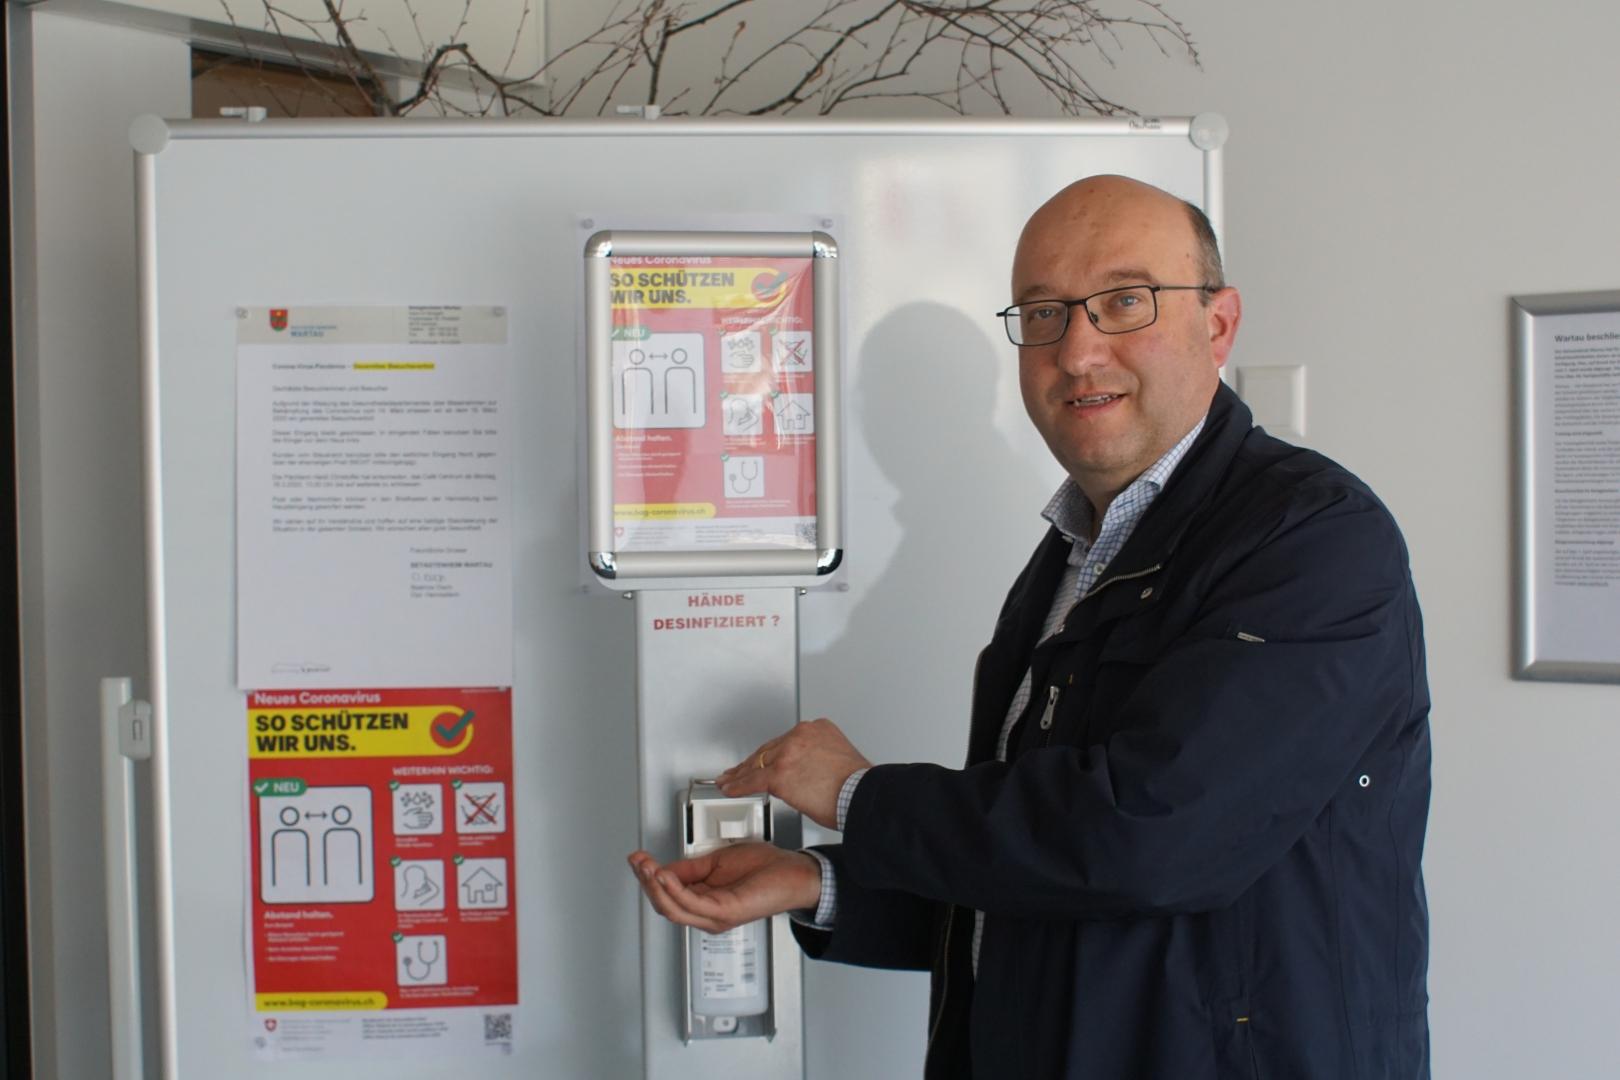 Demokratie trotz Covid-19 - Josef Dudli unterstützt Beat Tinner